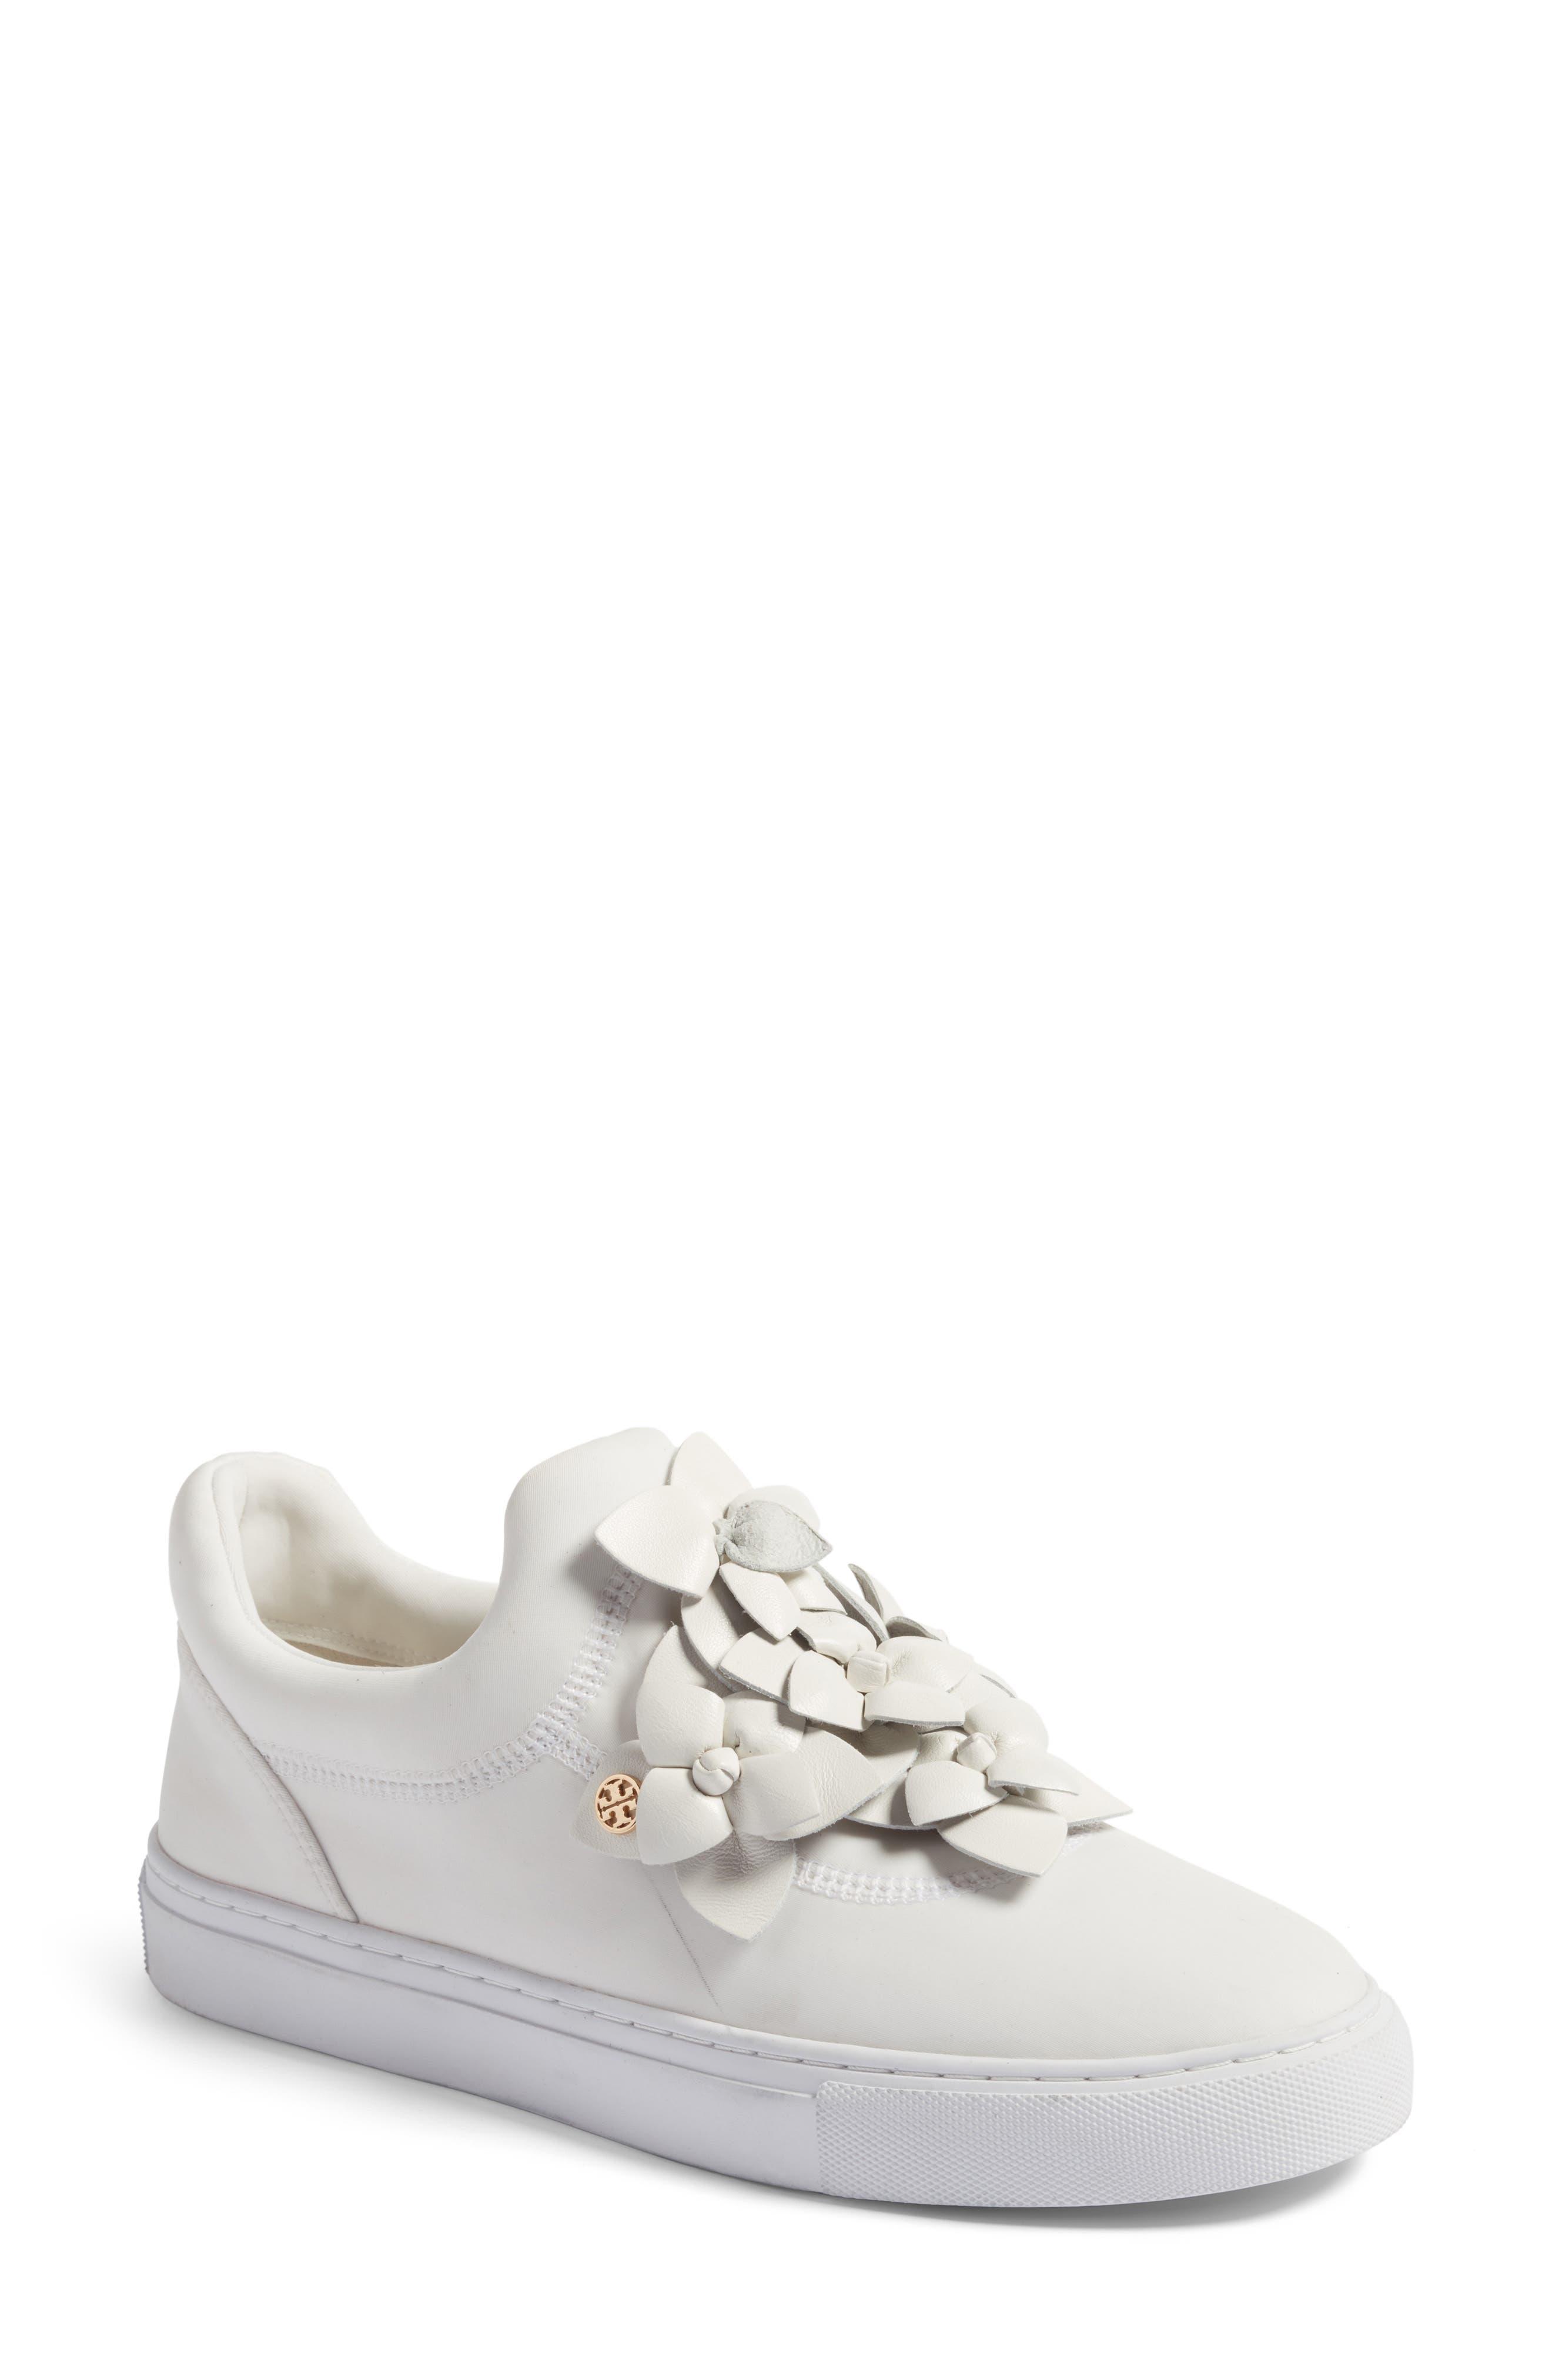 Alternate Image 1 Selected - Tory Burch Blossom Sneaker (Women)